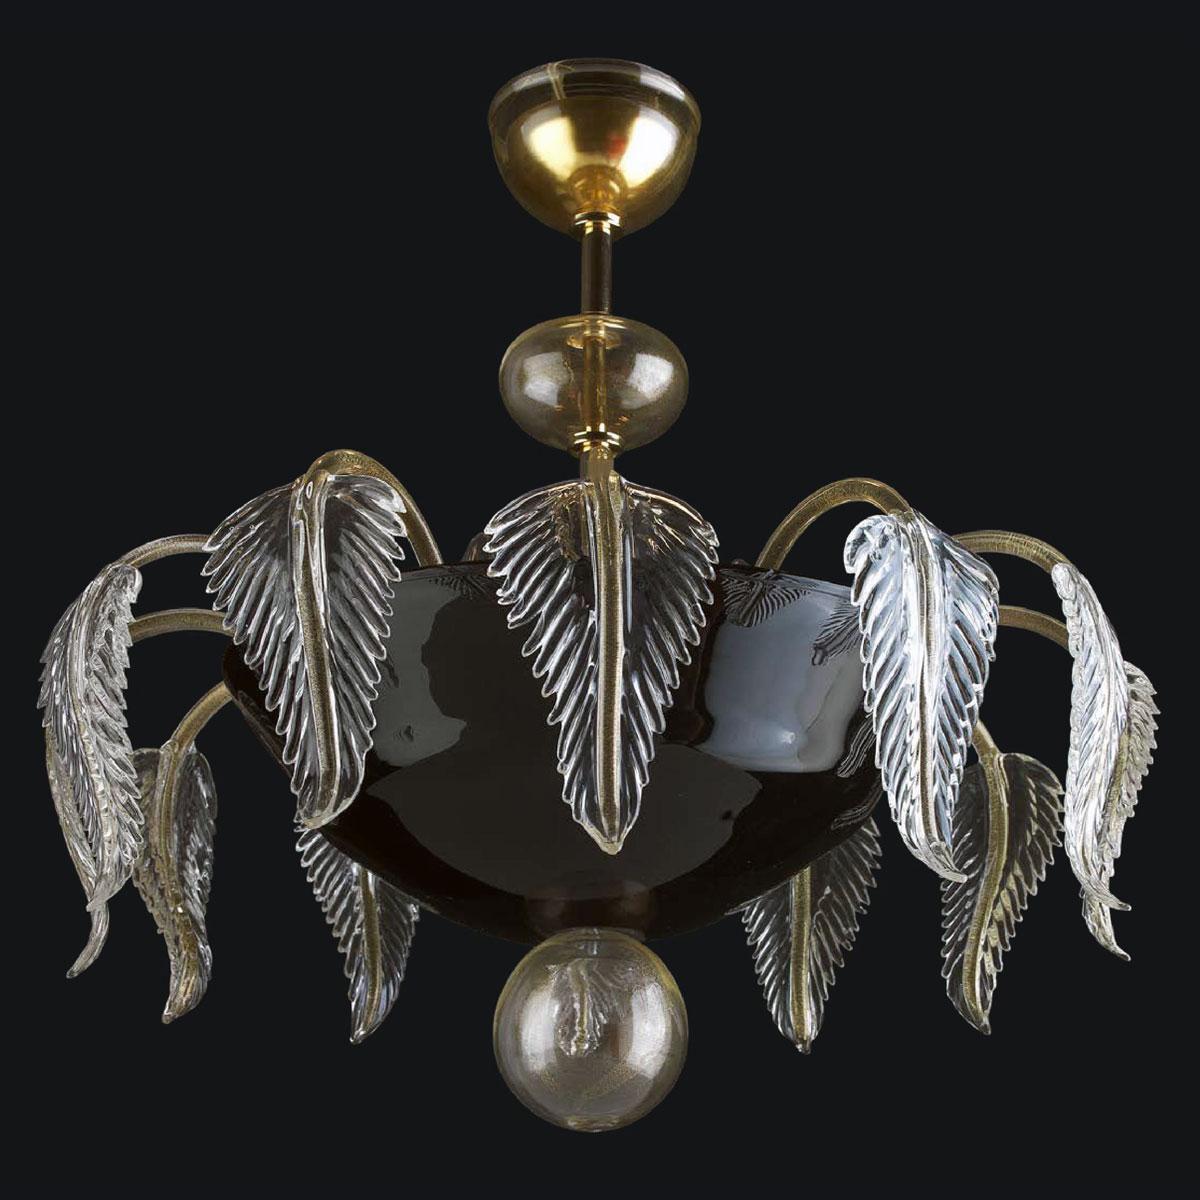 """Jaeden"" Murano glass ceiling light - 6 lights - black and gold"